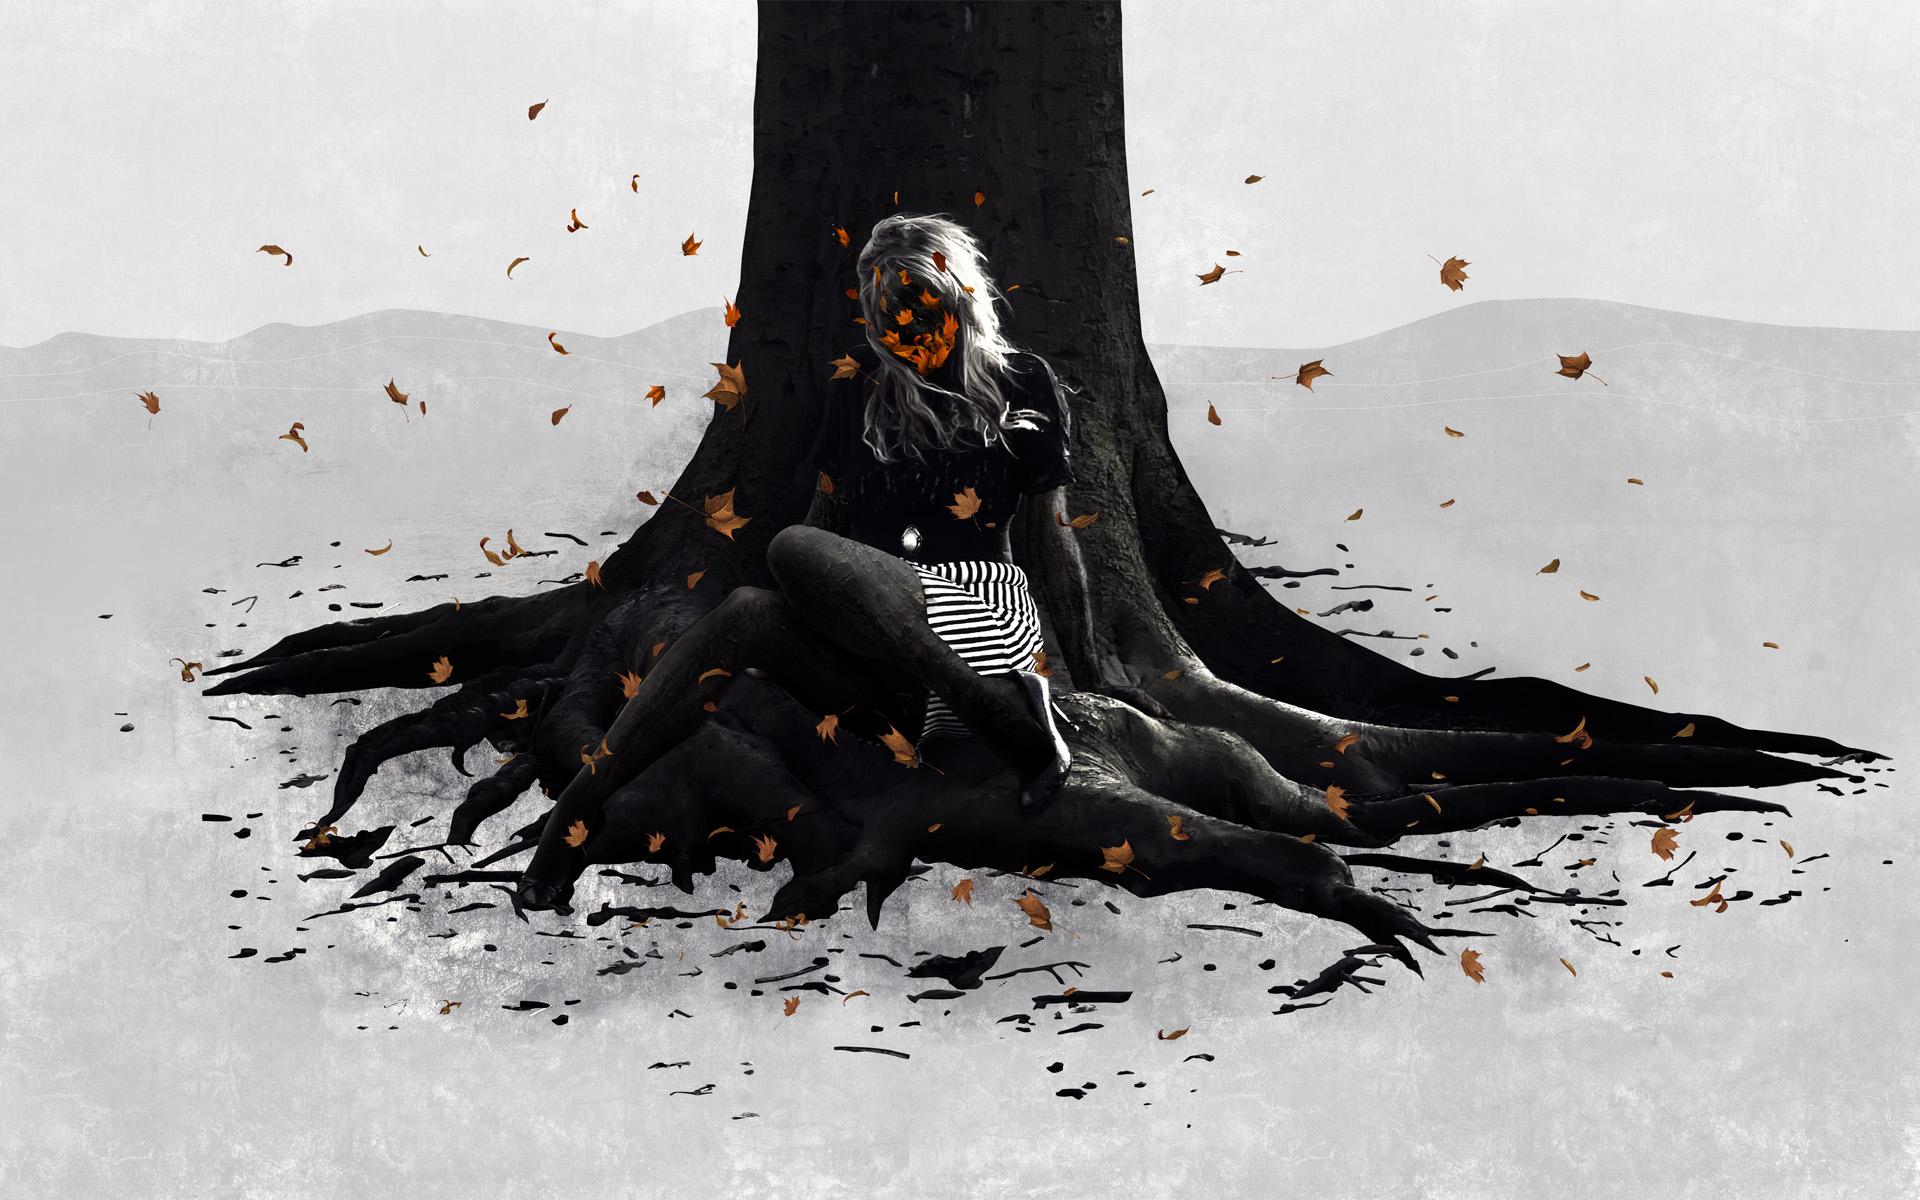 Artistic - Women  Woman Tree Fall Artistic Wallpaper